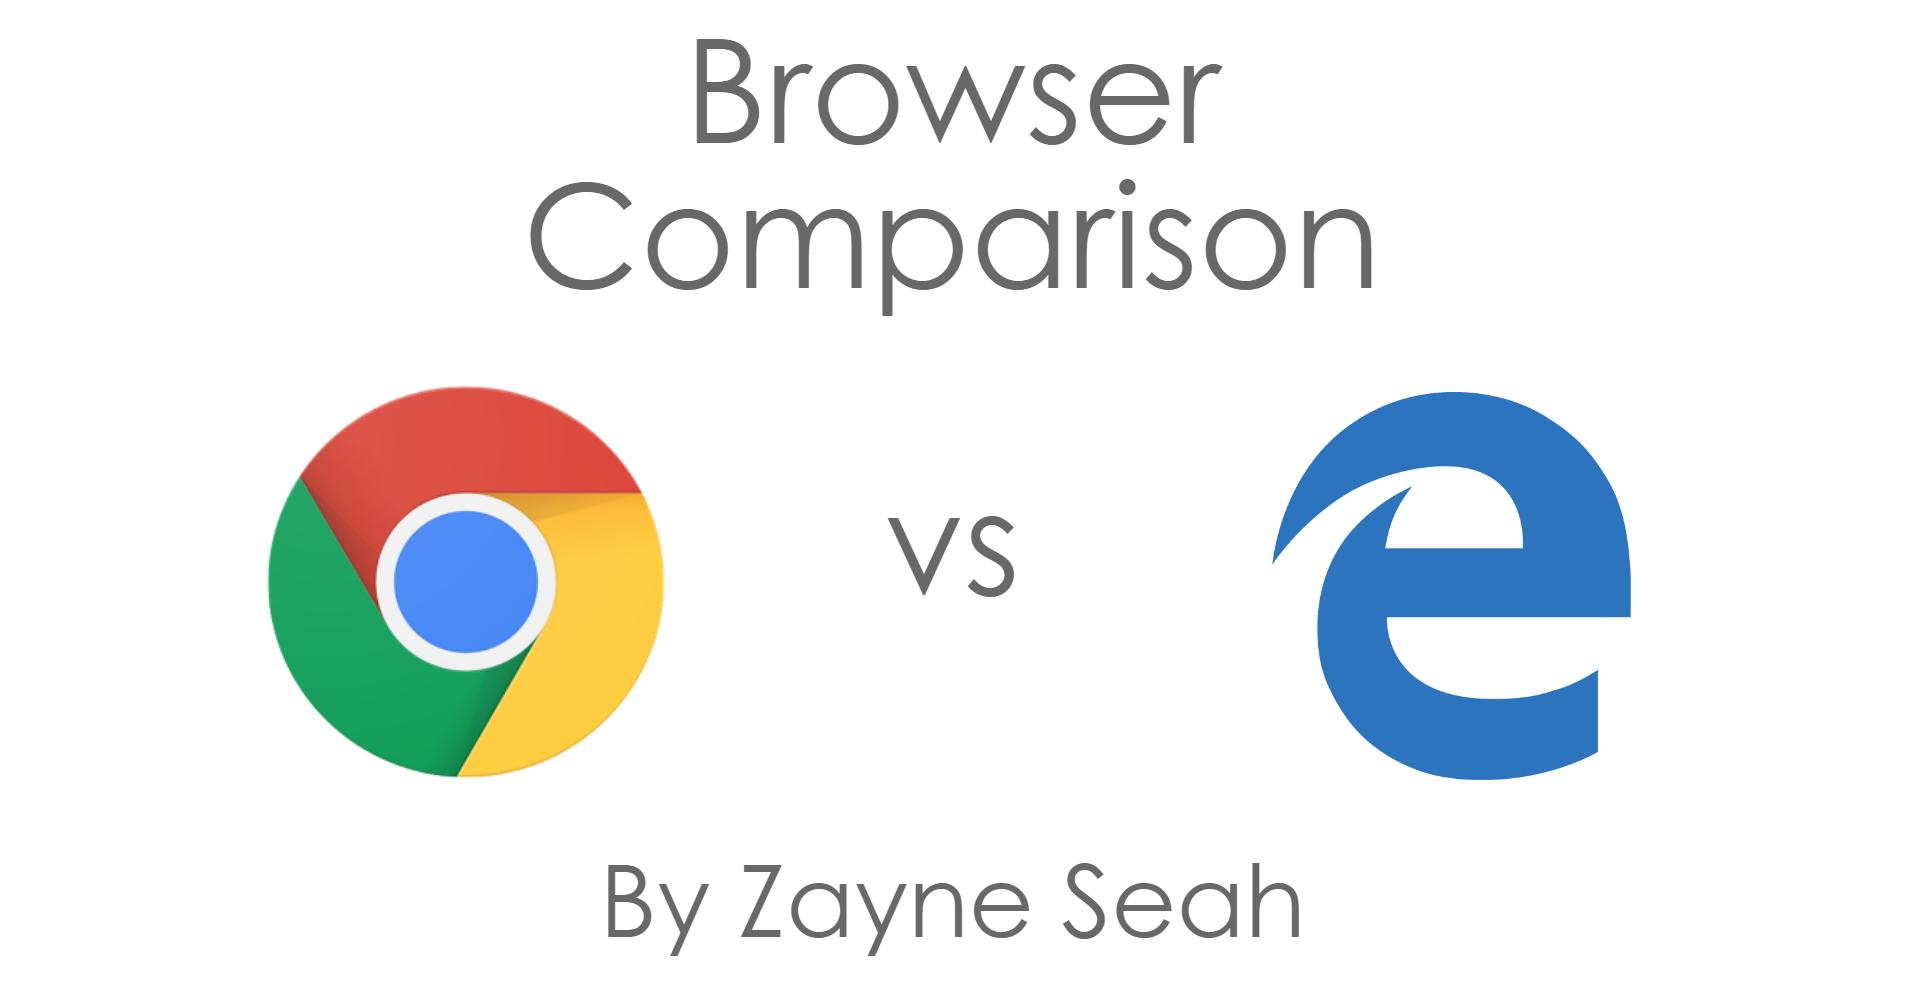 Google Chrome vs Microsoft Edge: A Concise Shootout - http://vr-zone.com/articles/google-chrome-vs-microsoft-edge-concise-shootout/117402.html